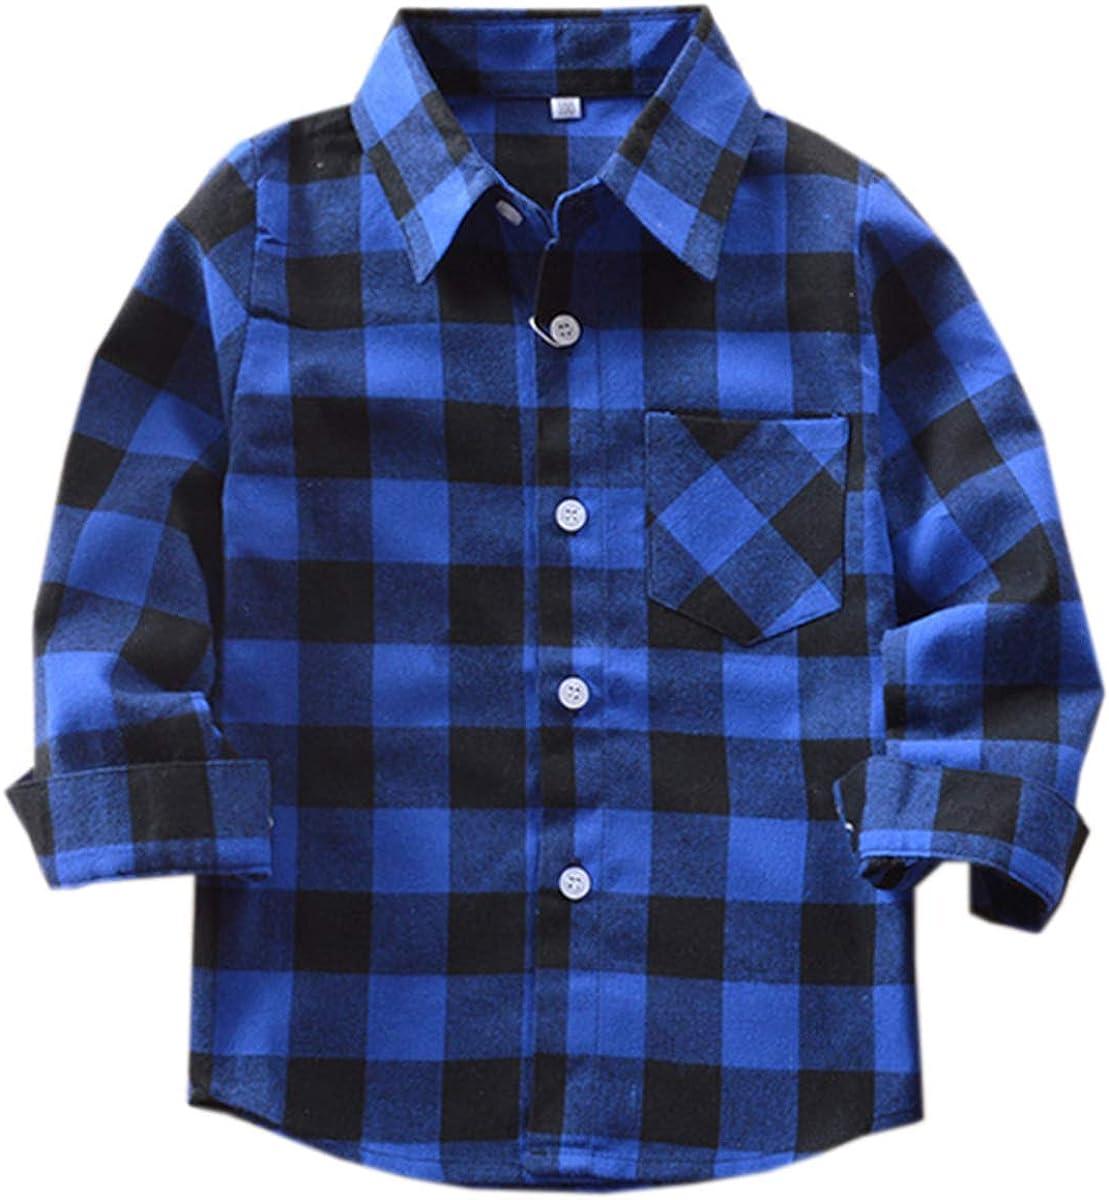 Betusline Boys' Button Down Plaid Shirt